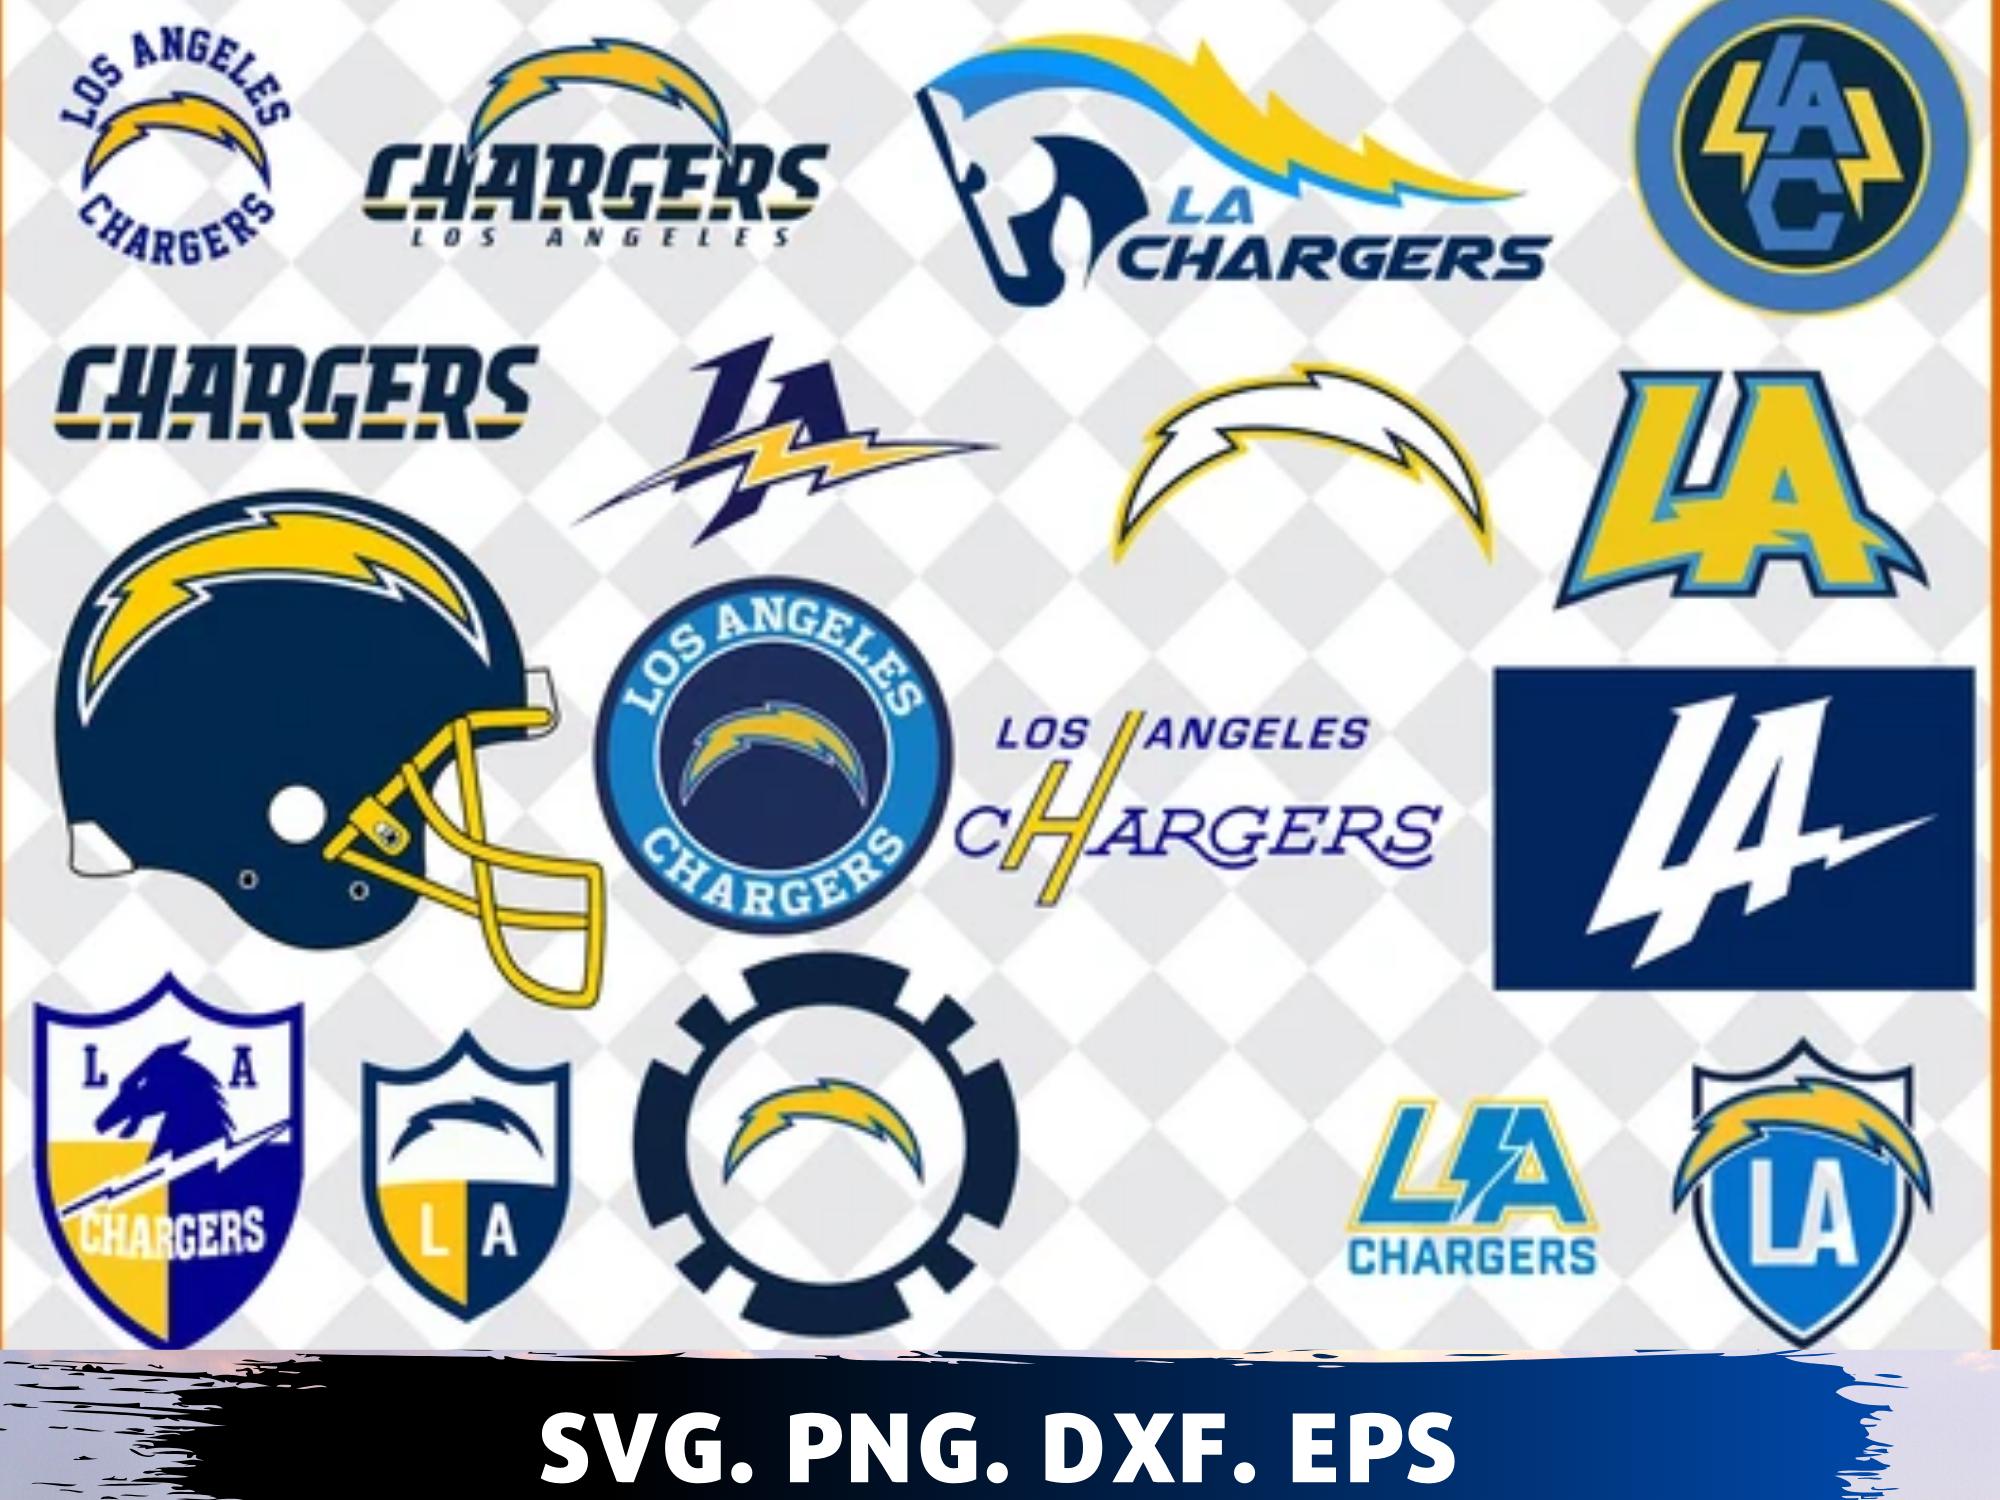 Clipartshop Los Angeles Chargers Los Angeles Chargers Svg Los Angeles Chargers Clipart Los Angeles Chargers Logo Los Angeles Chargers Chargers Football Sports Svg